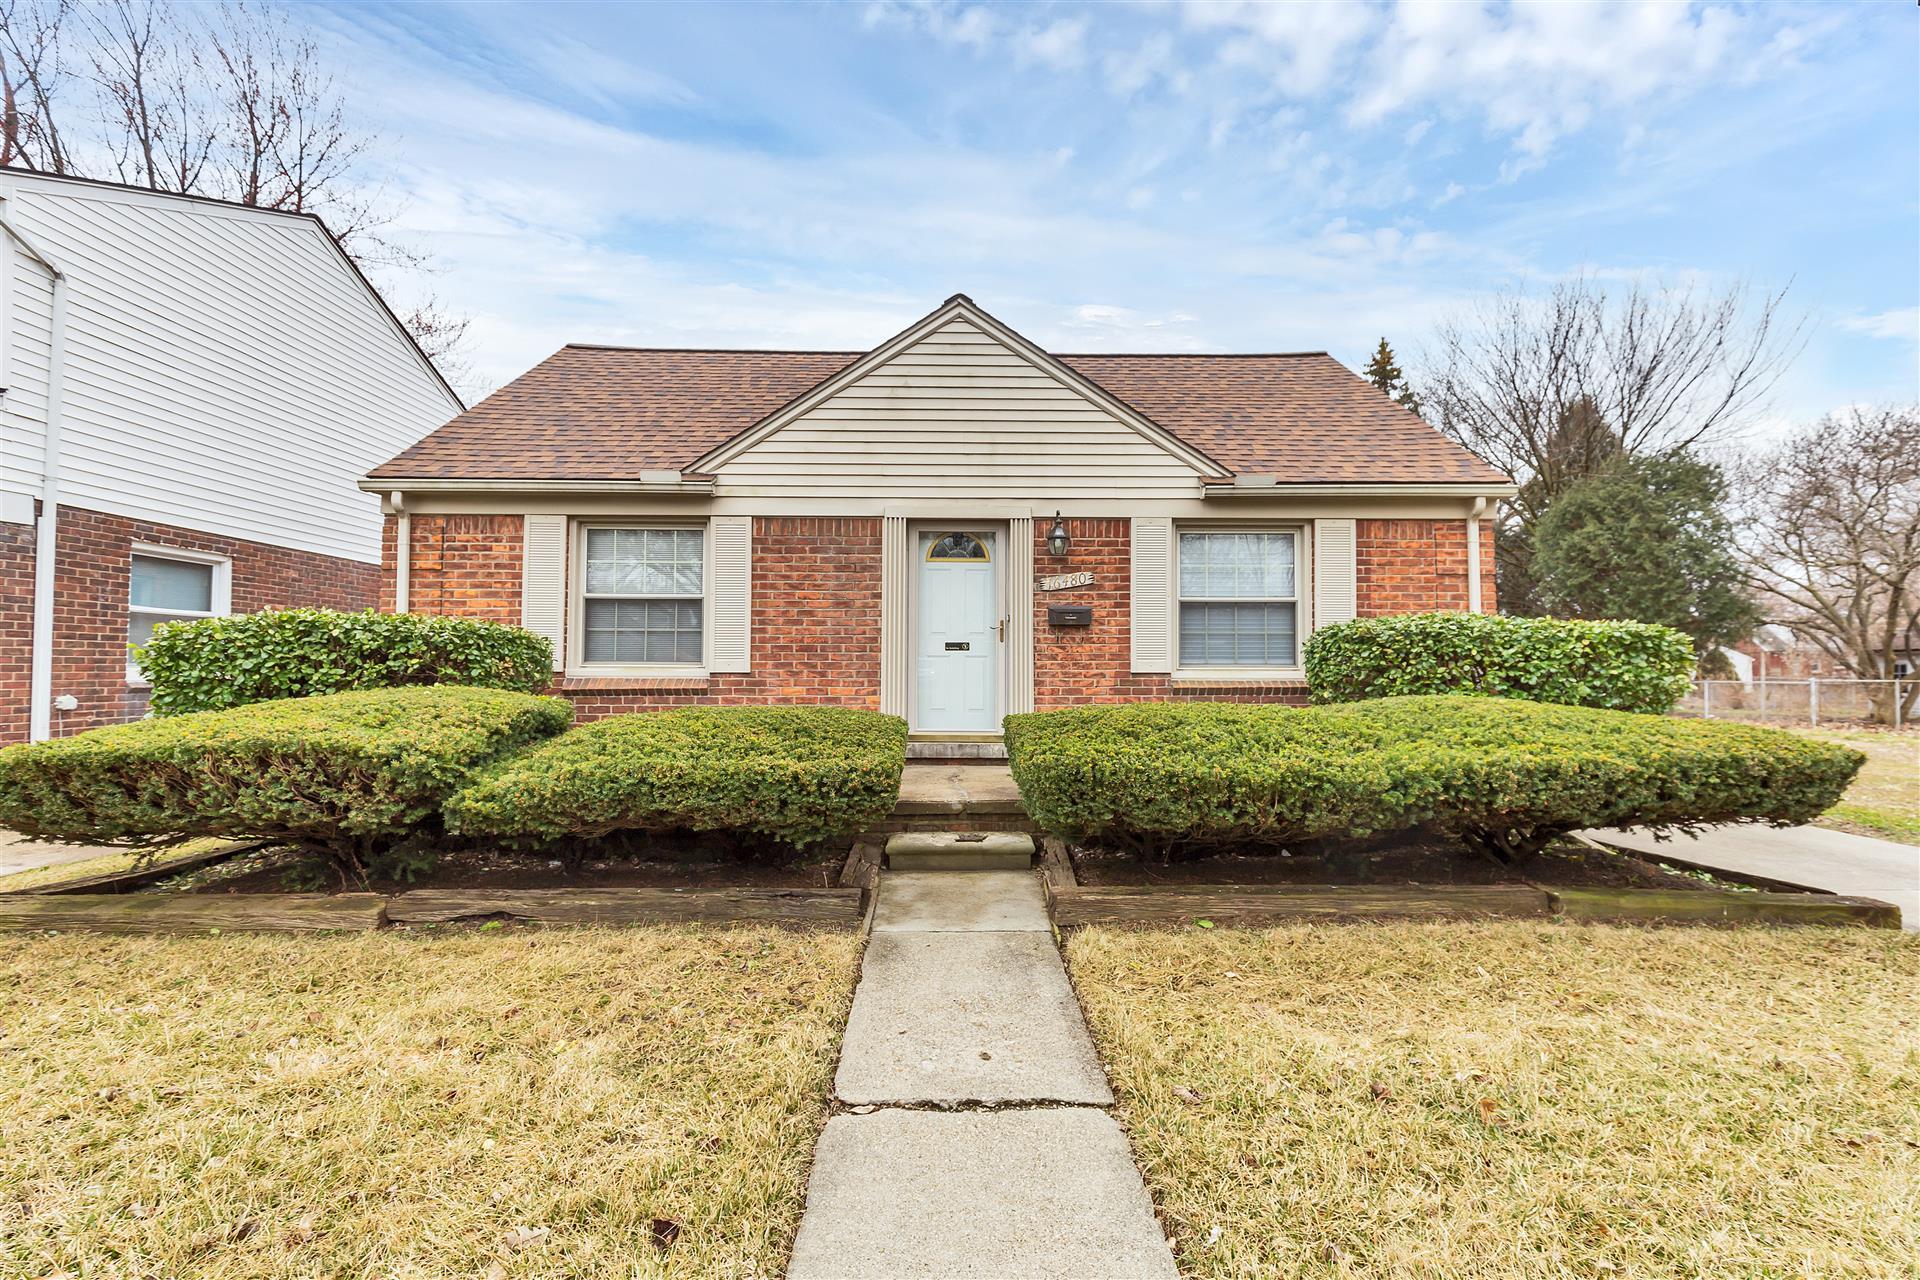 SALE PENDING – 5360 Connell Rd, Emmett 48022 – On 20 Acres!